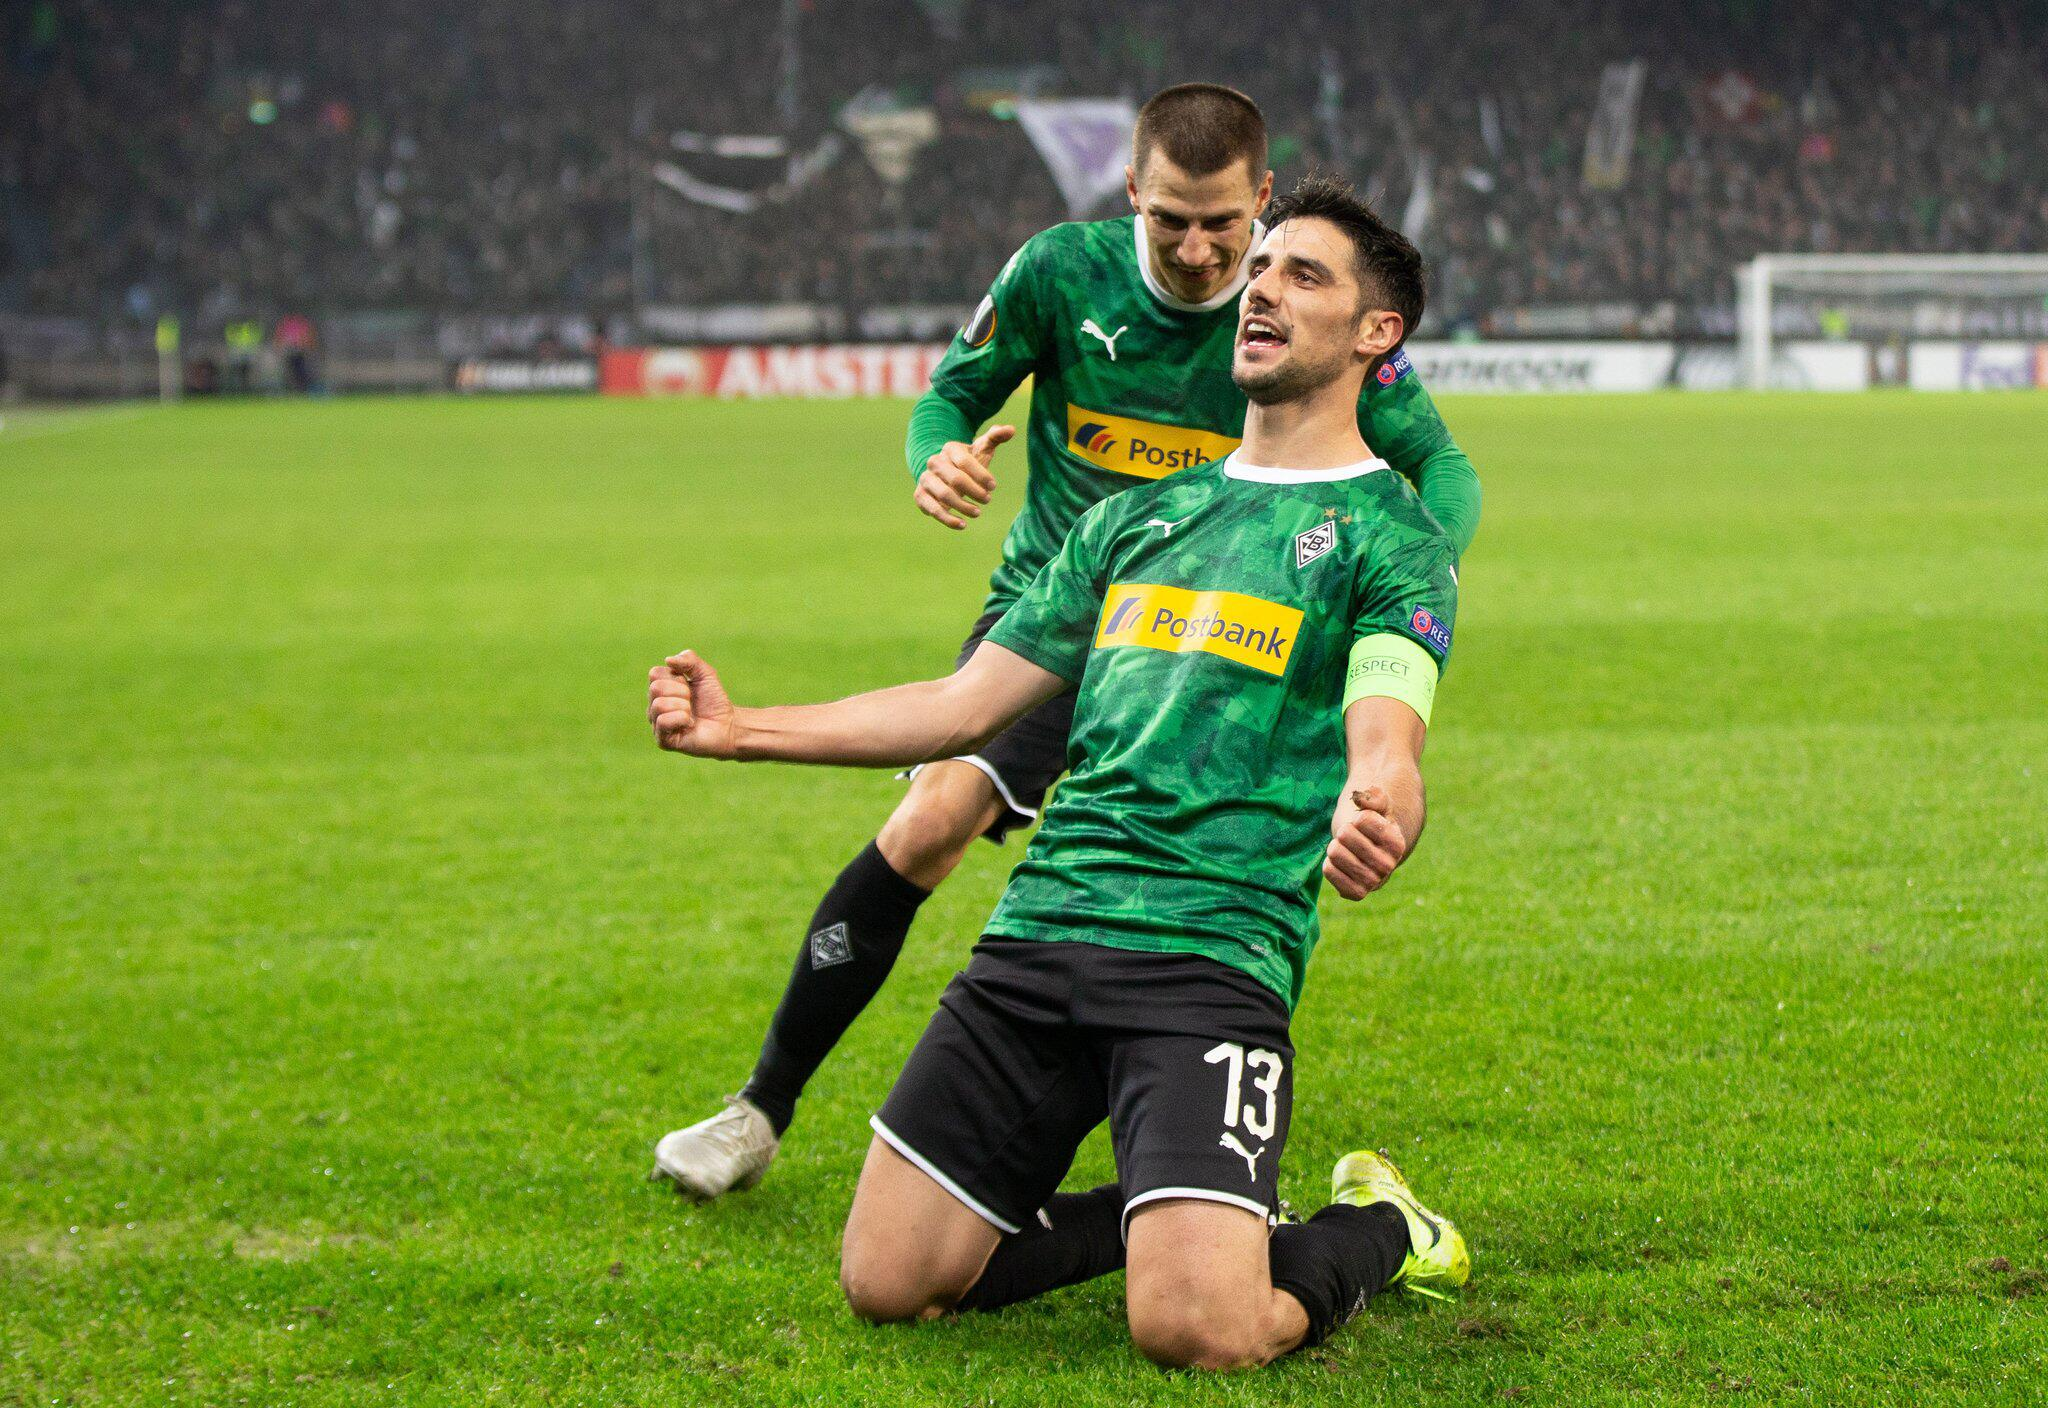 Bild zu UEFA Europa League - Wolfsberger AC vs Borussia Monchengladbach